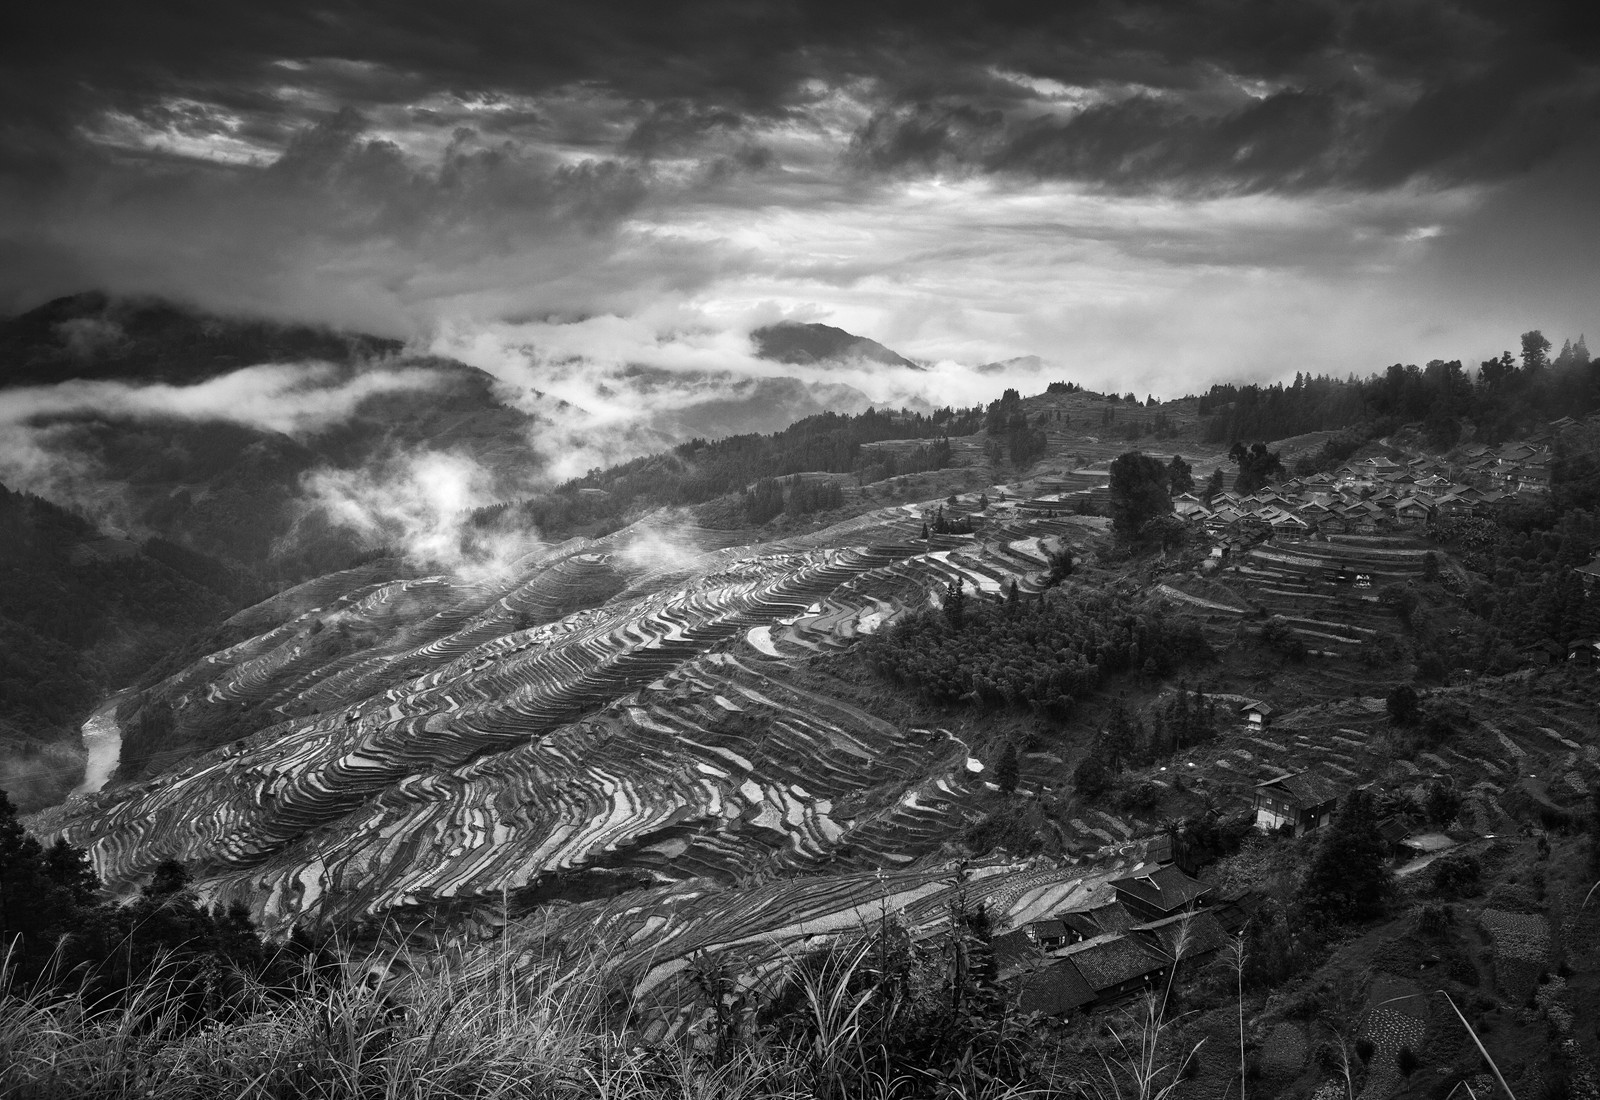 kuang-huimin-ancient-kam-rice-of-millennium-photography-of-china-(1).jpg